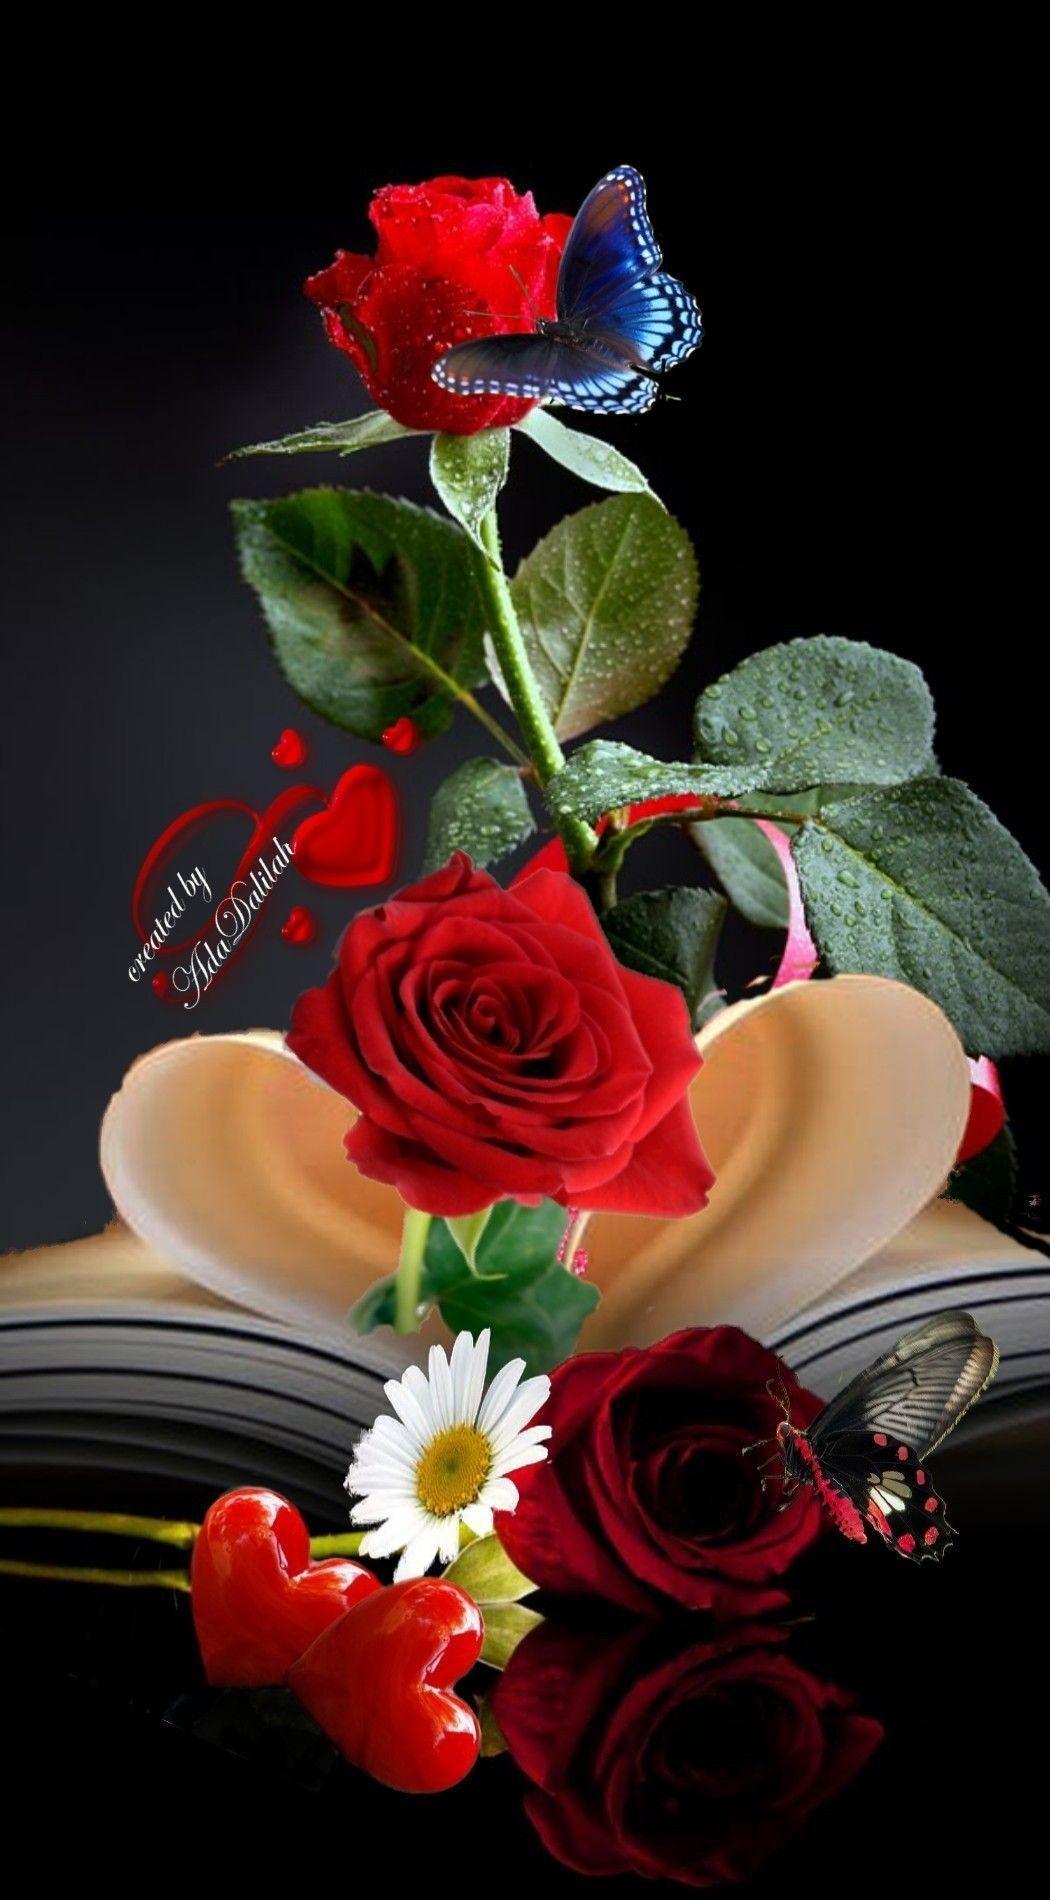 Romantic Love Flowers Wallpapers Top Free Romantic Love Flowers Backgrounds Wallpaperaccess